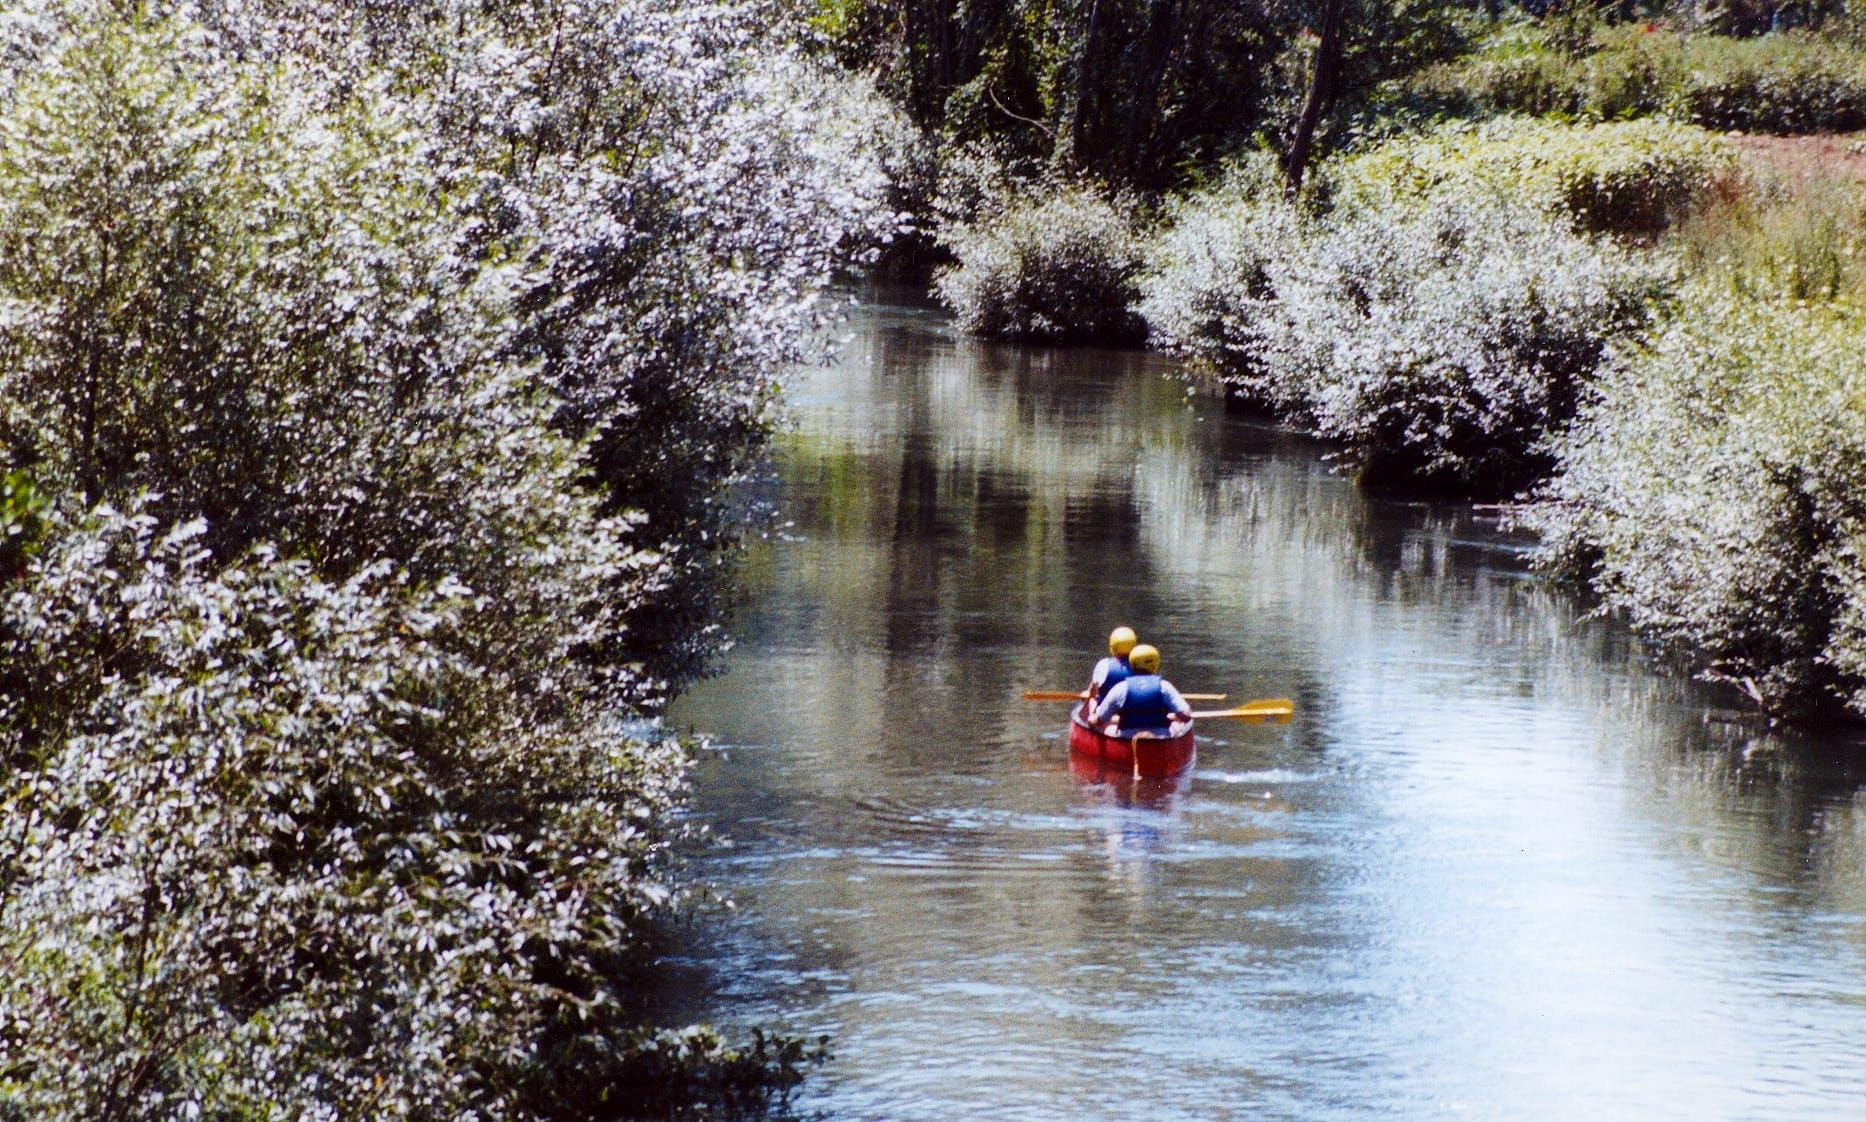 Canoe Rental in Scheggino, Italy